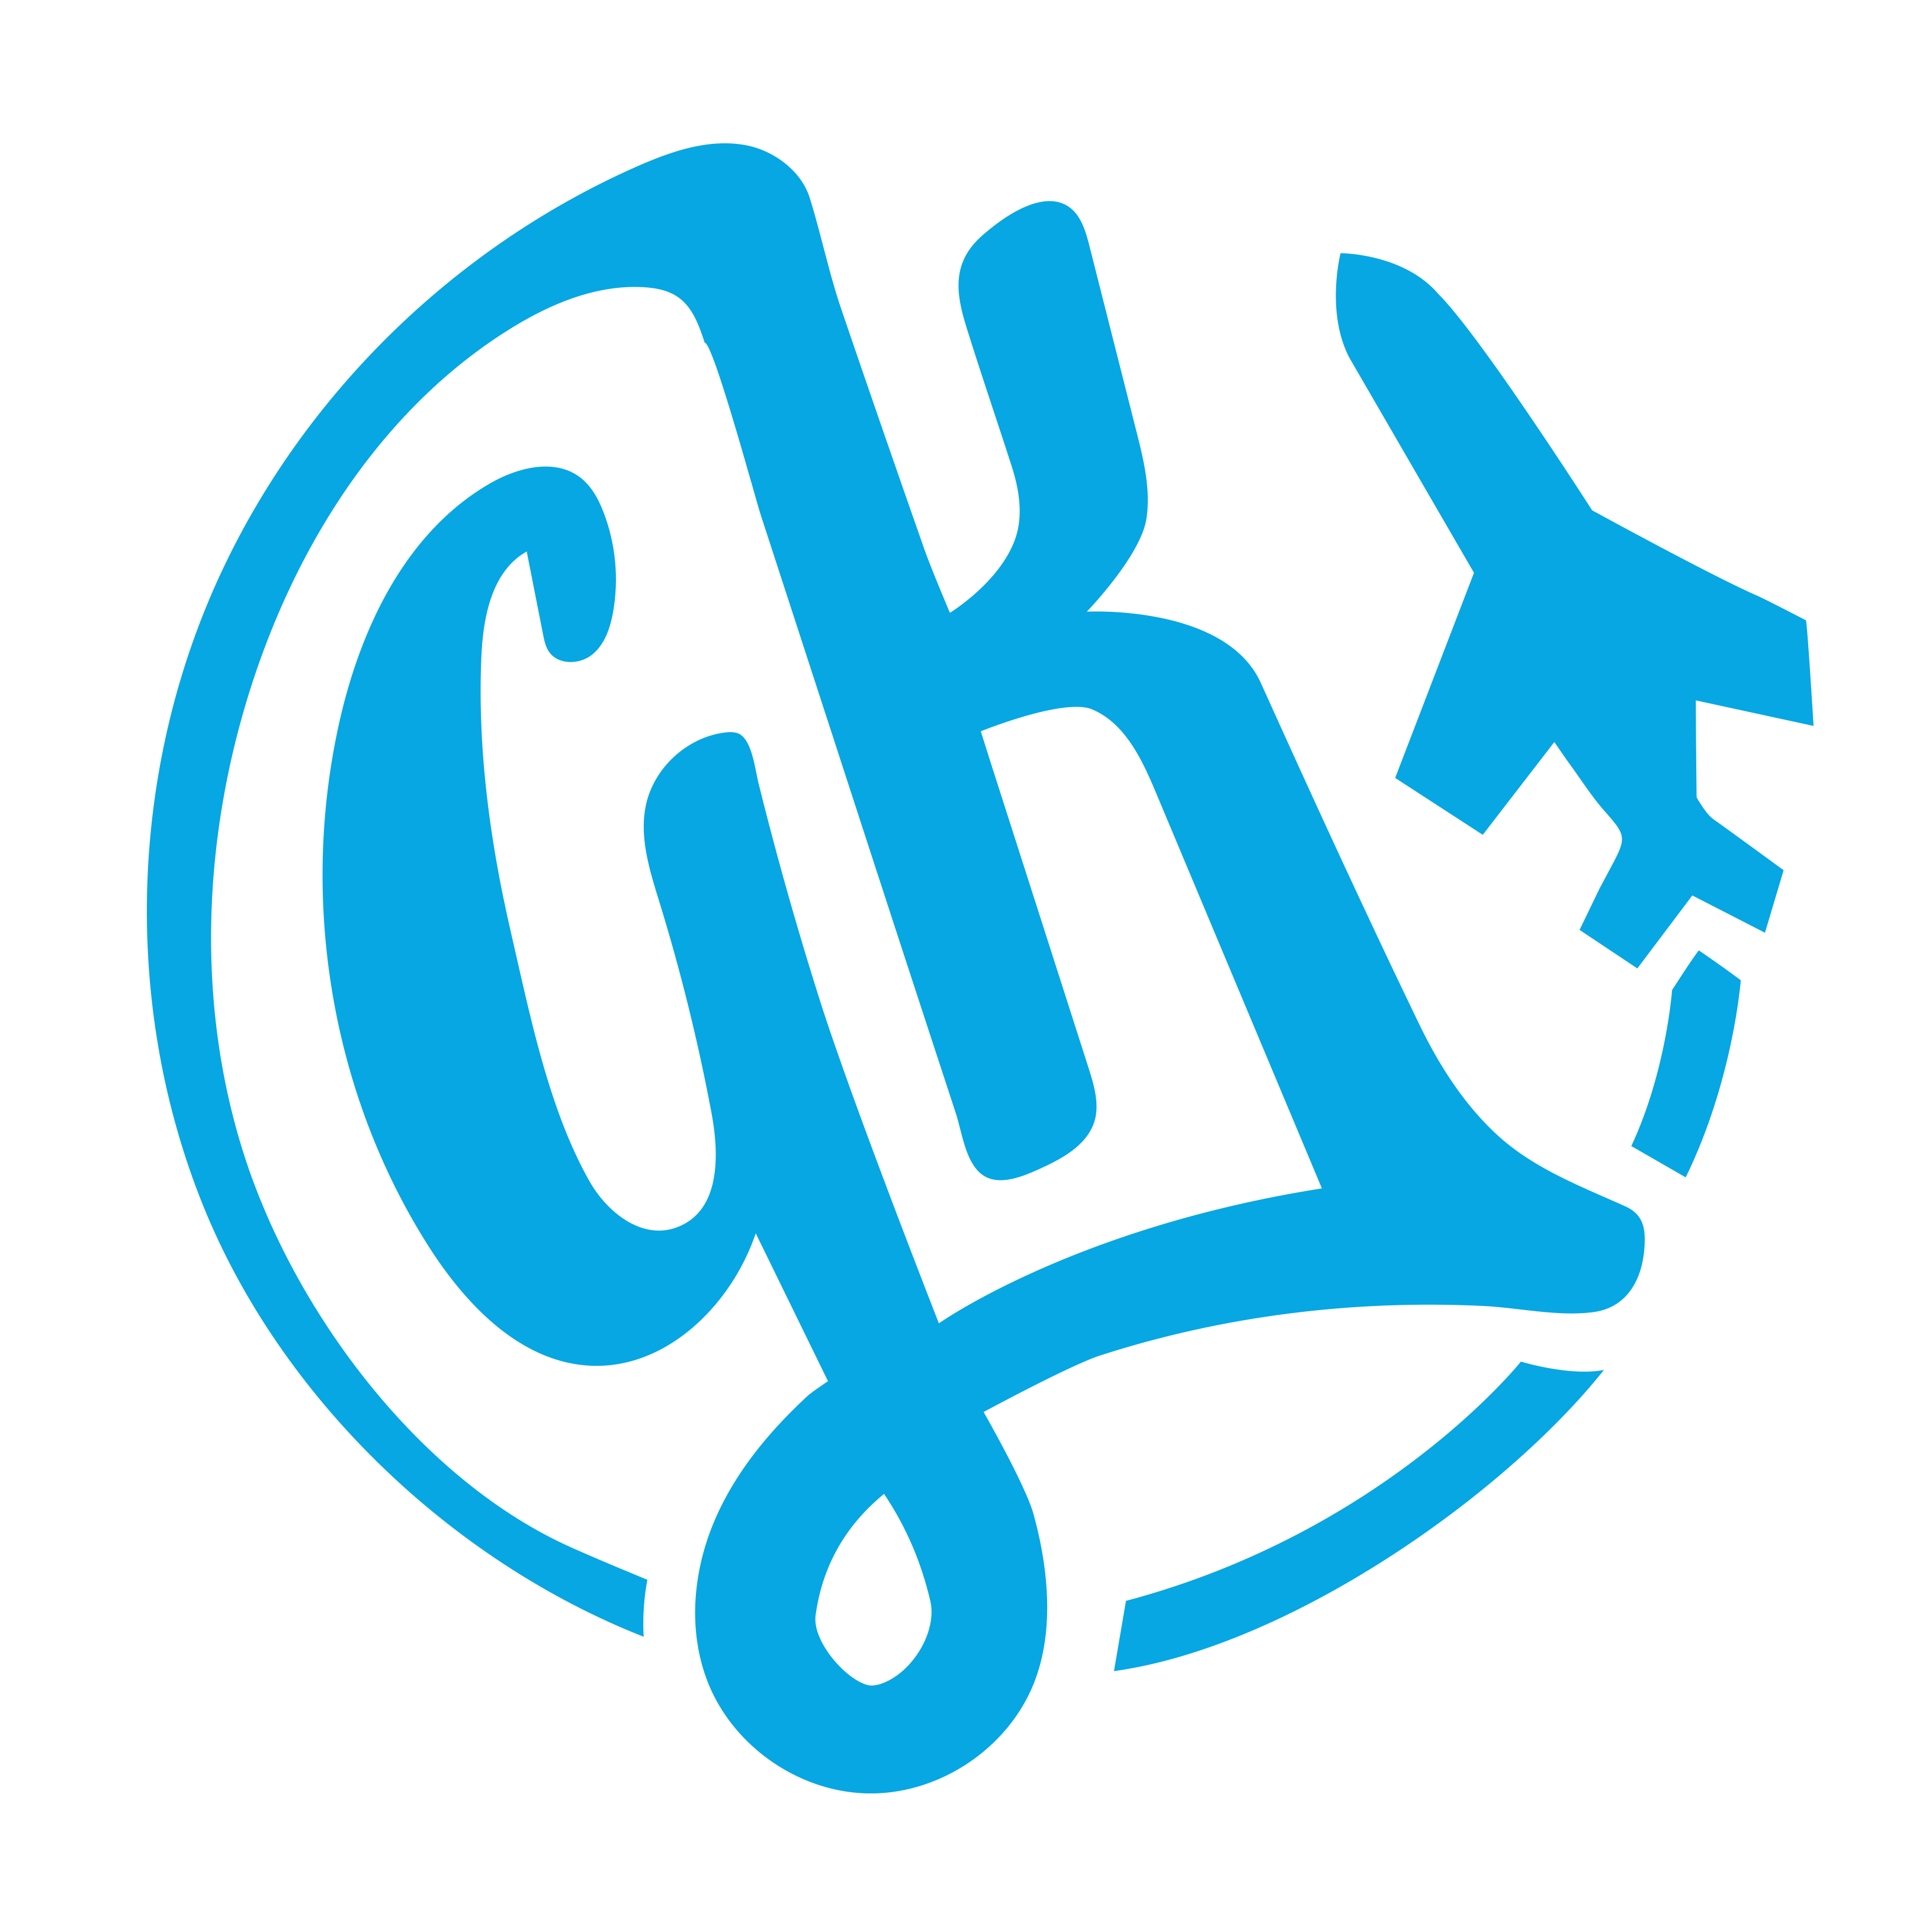 GlobeKick